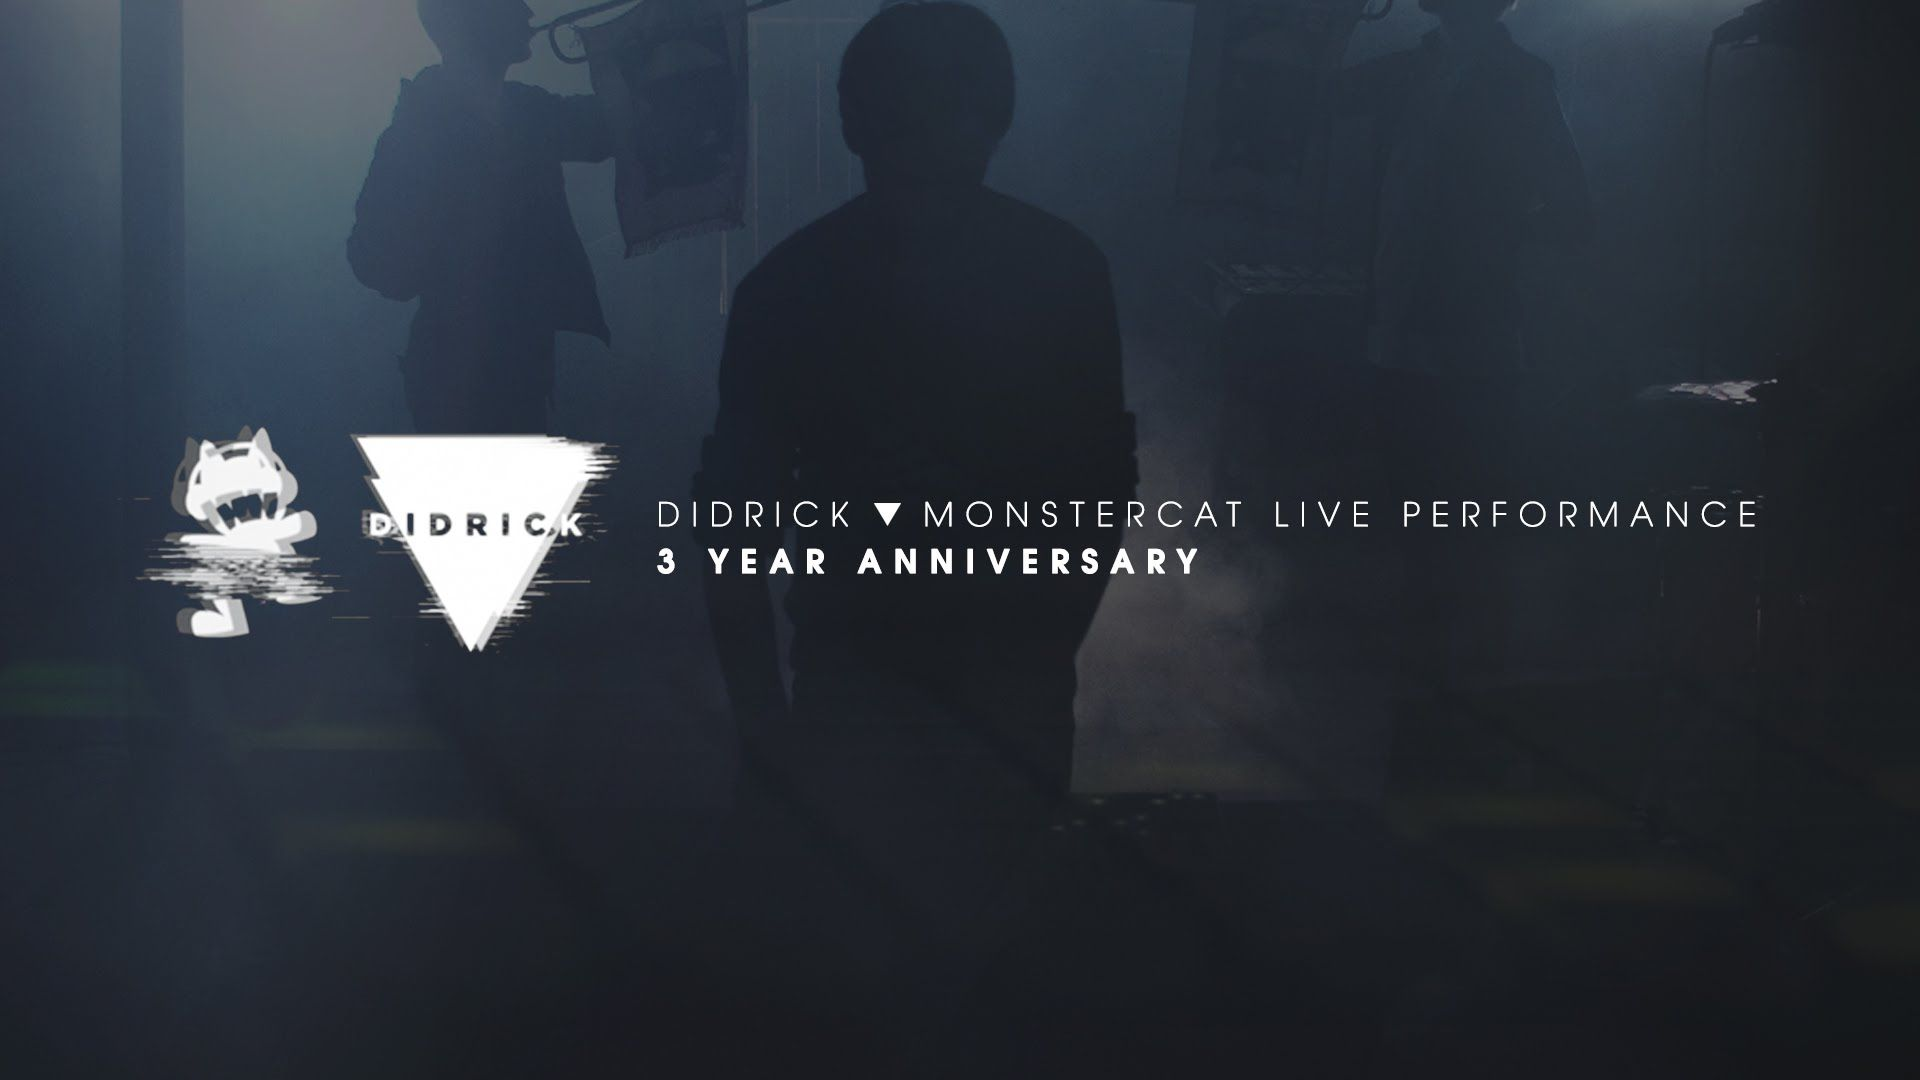 Monstercat Live Performance by Didrick [3 Year Anniversary Mix] plz watch plz monster c a t  i maker